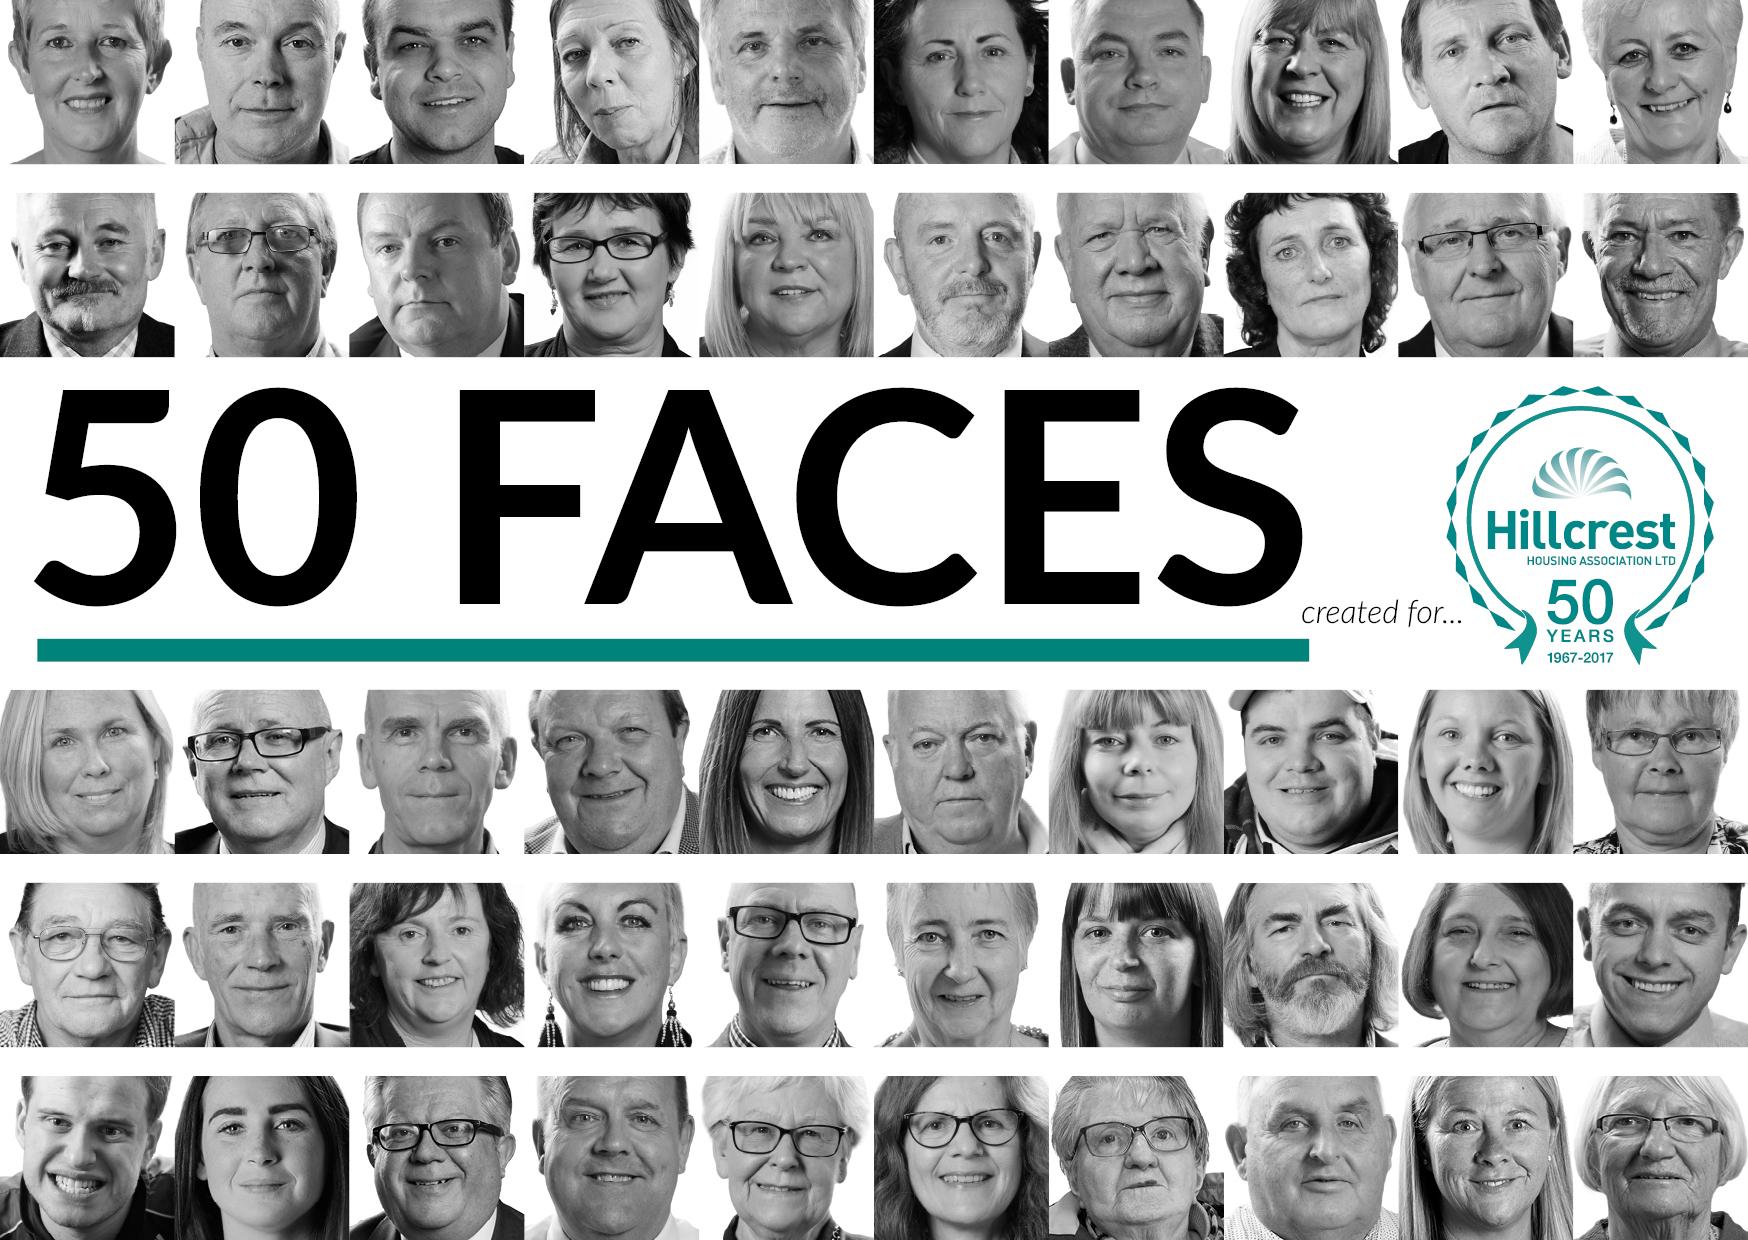 50 Faces of Hillcrest